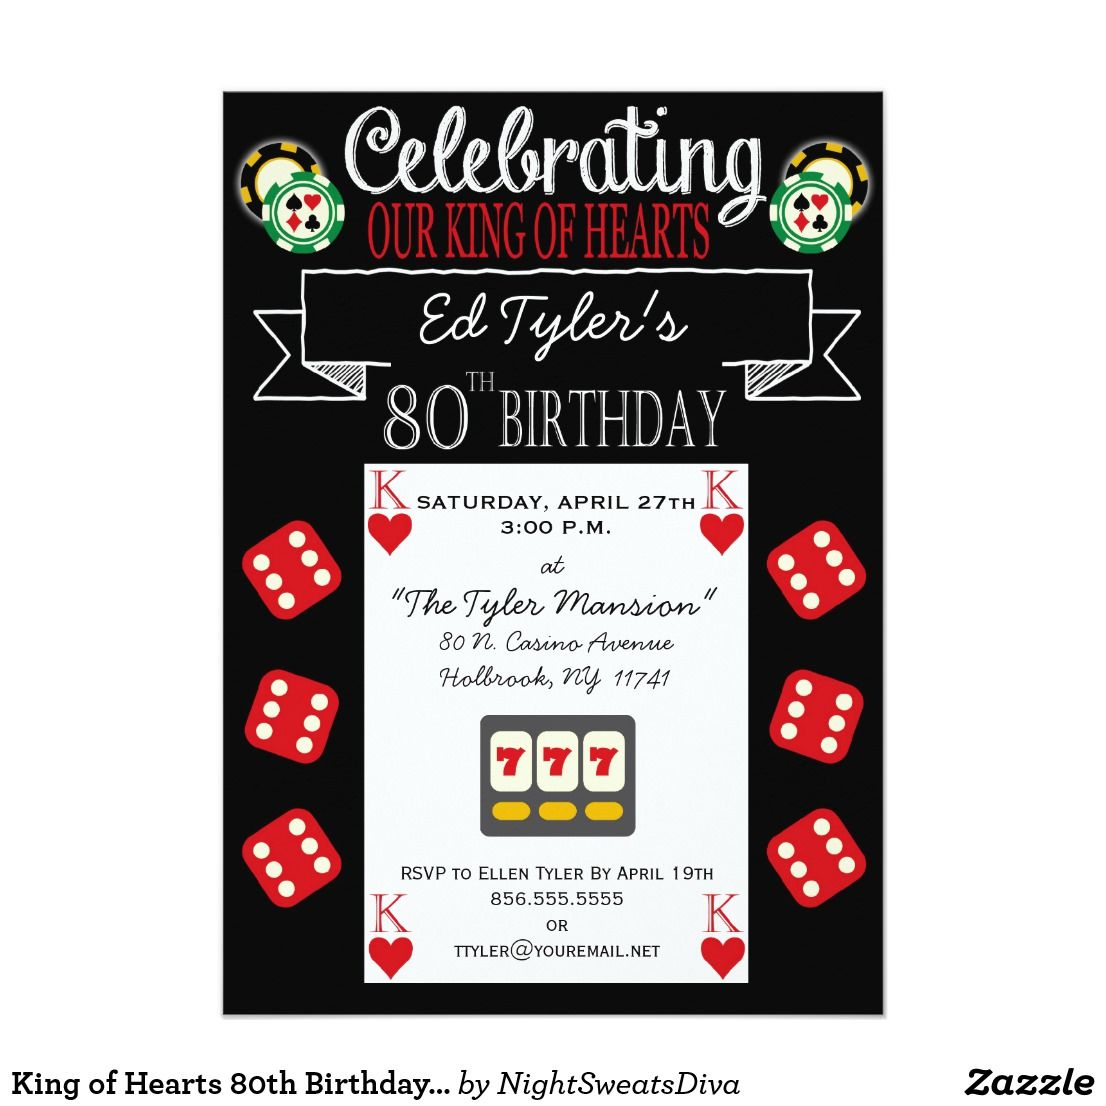 King of Hearts 80th Birthday Party Invitation   80 birthday, Party ...